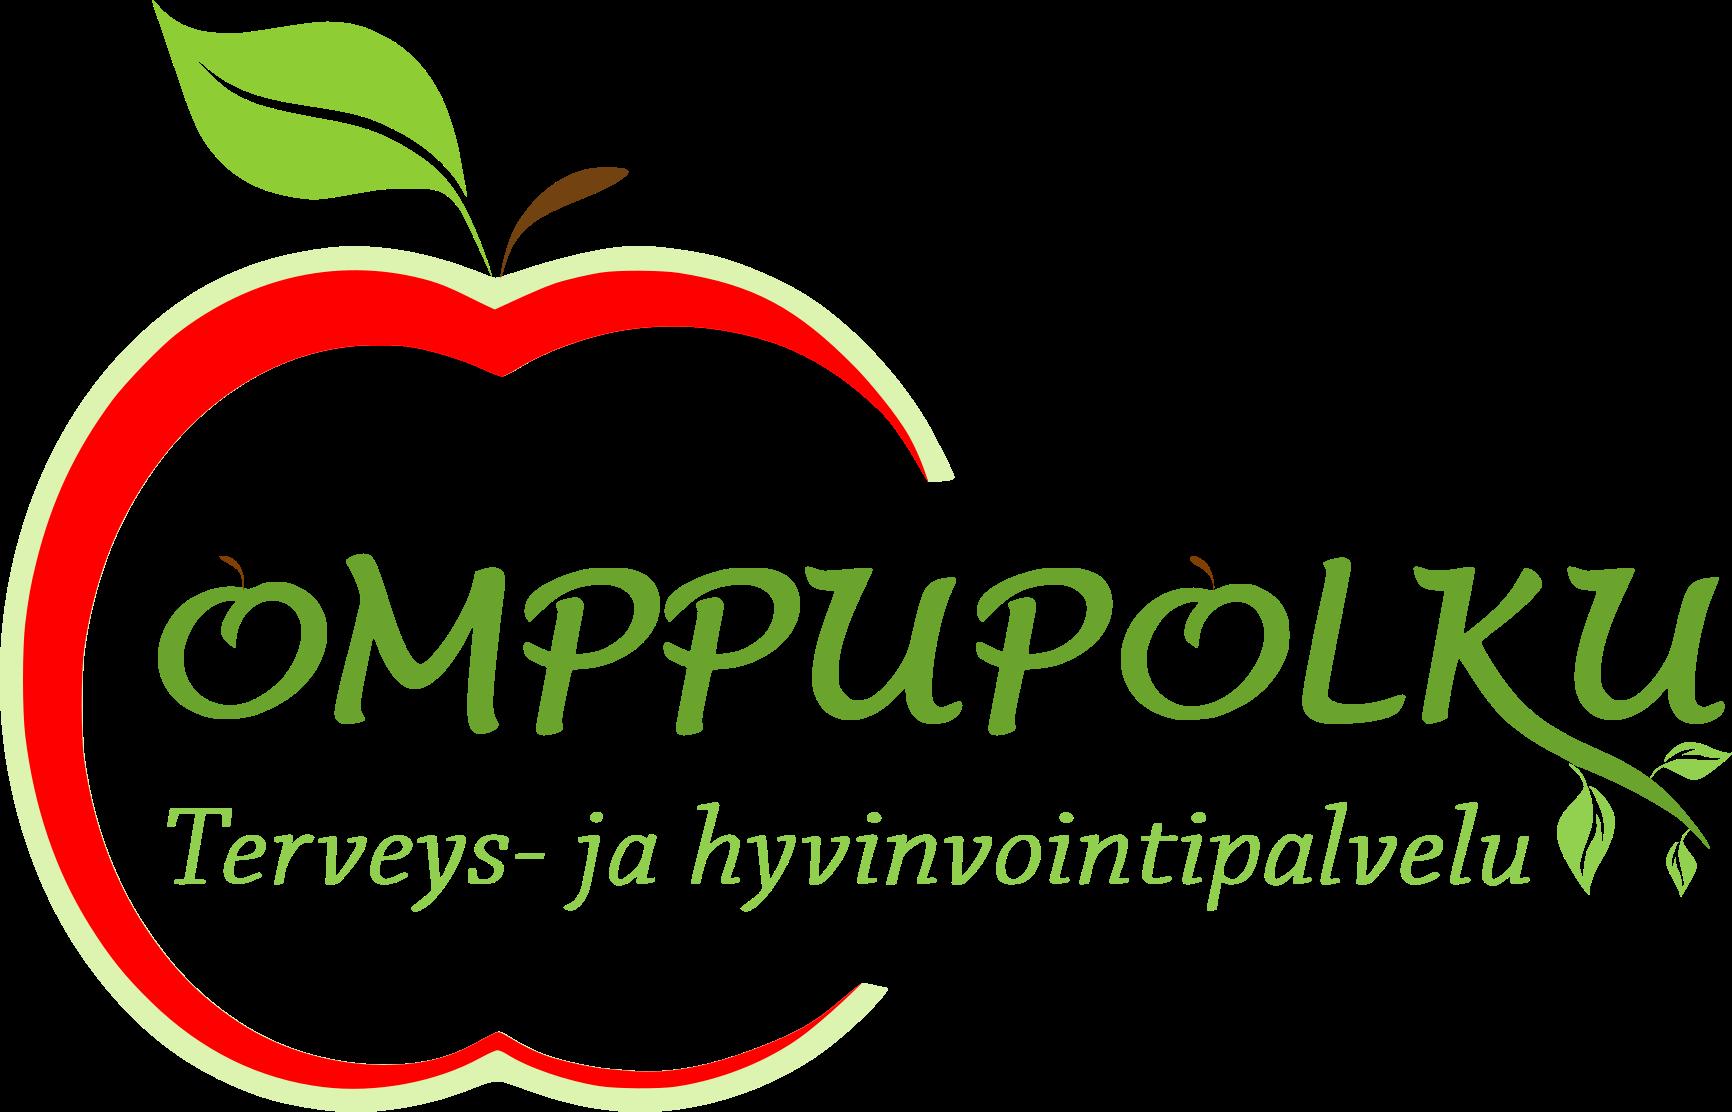 Omppupolku.fi